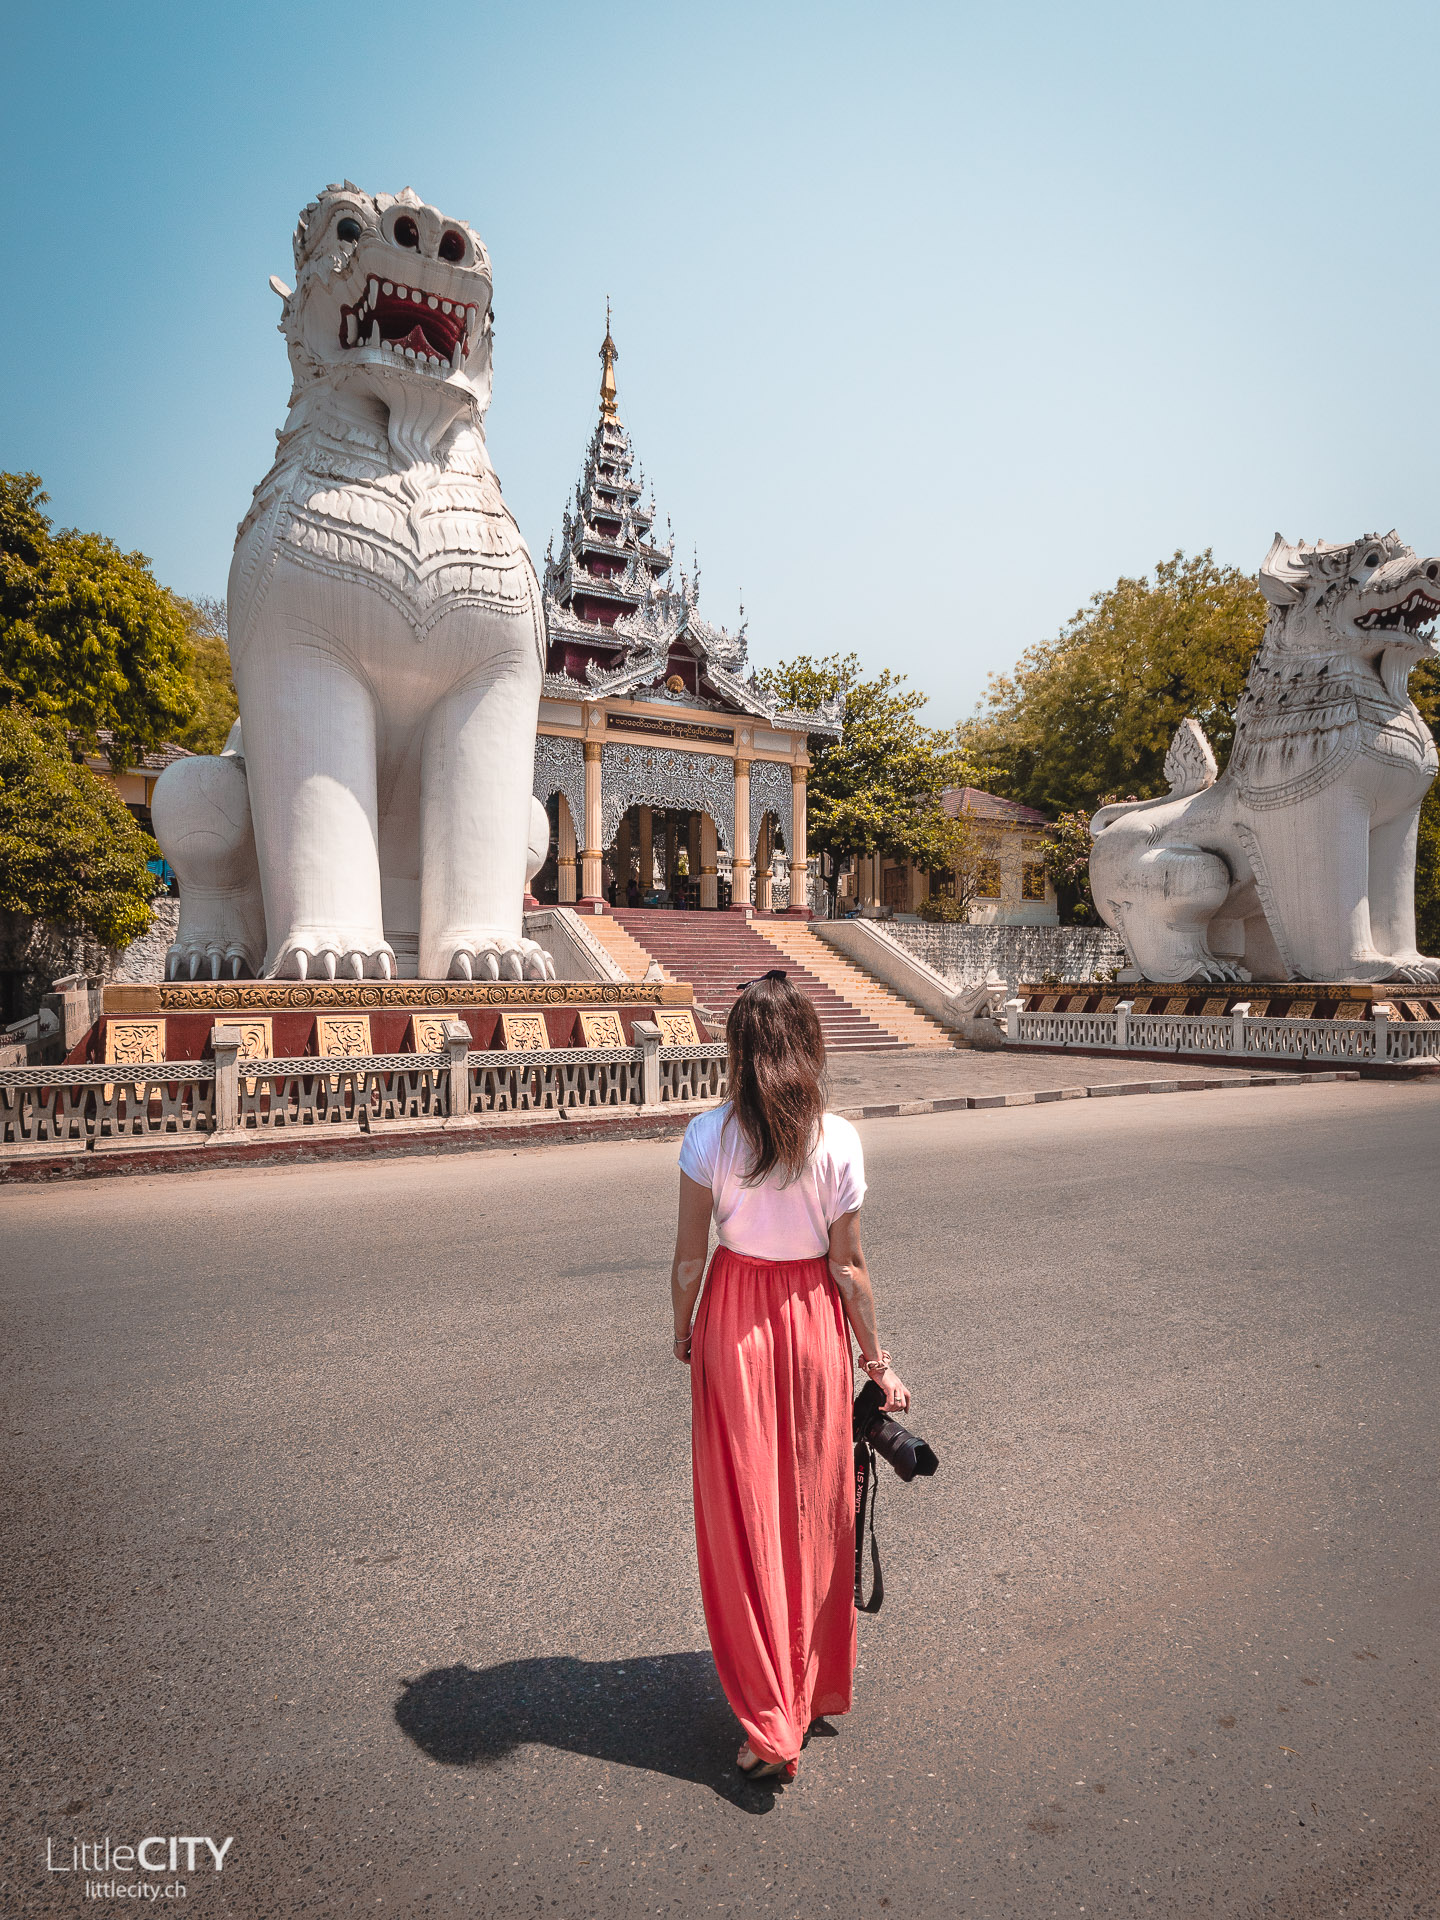 Mandalay Hill Treppe